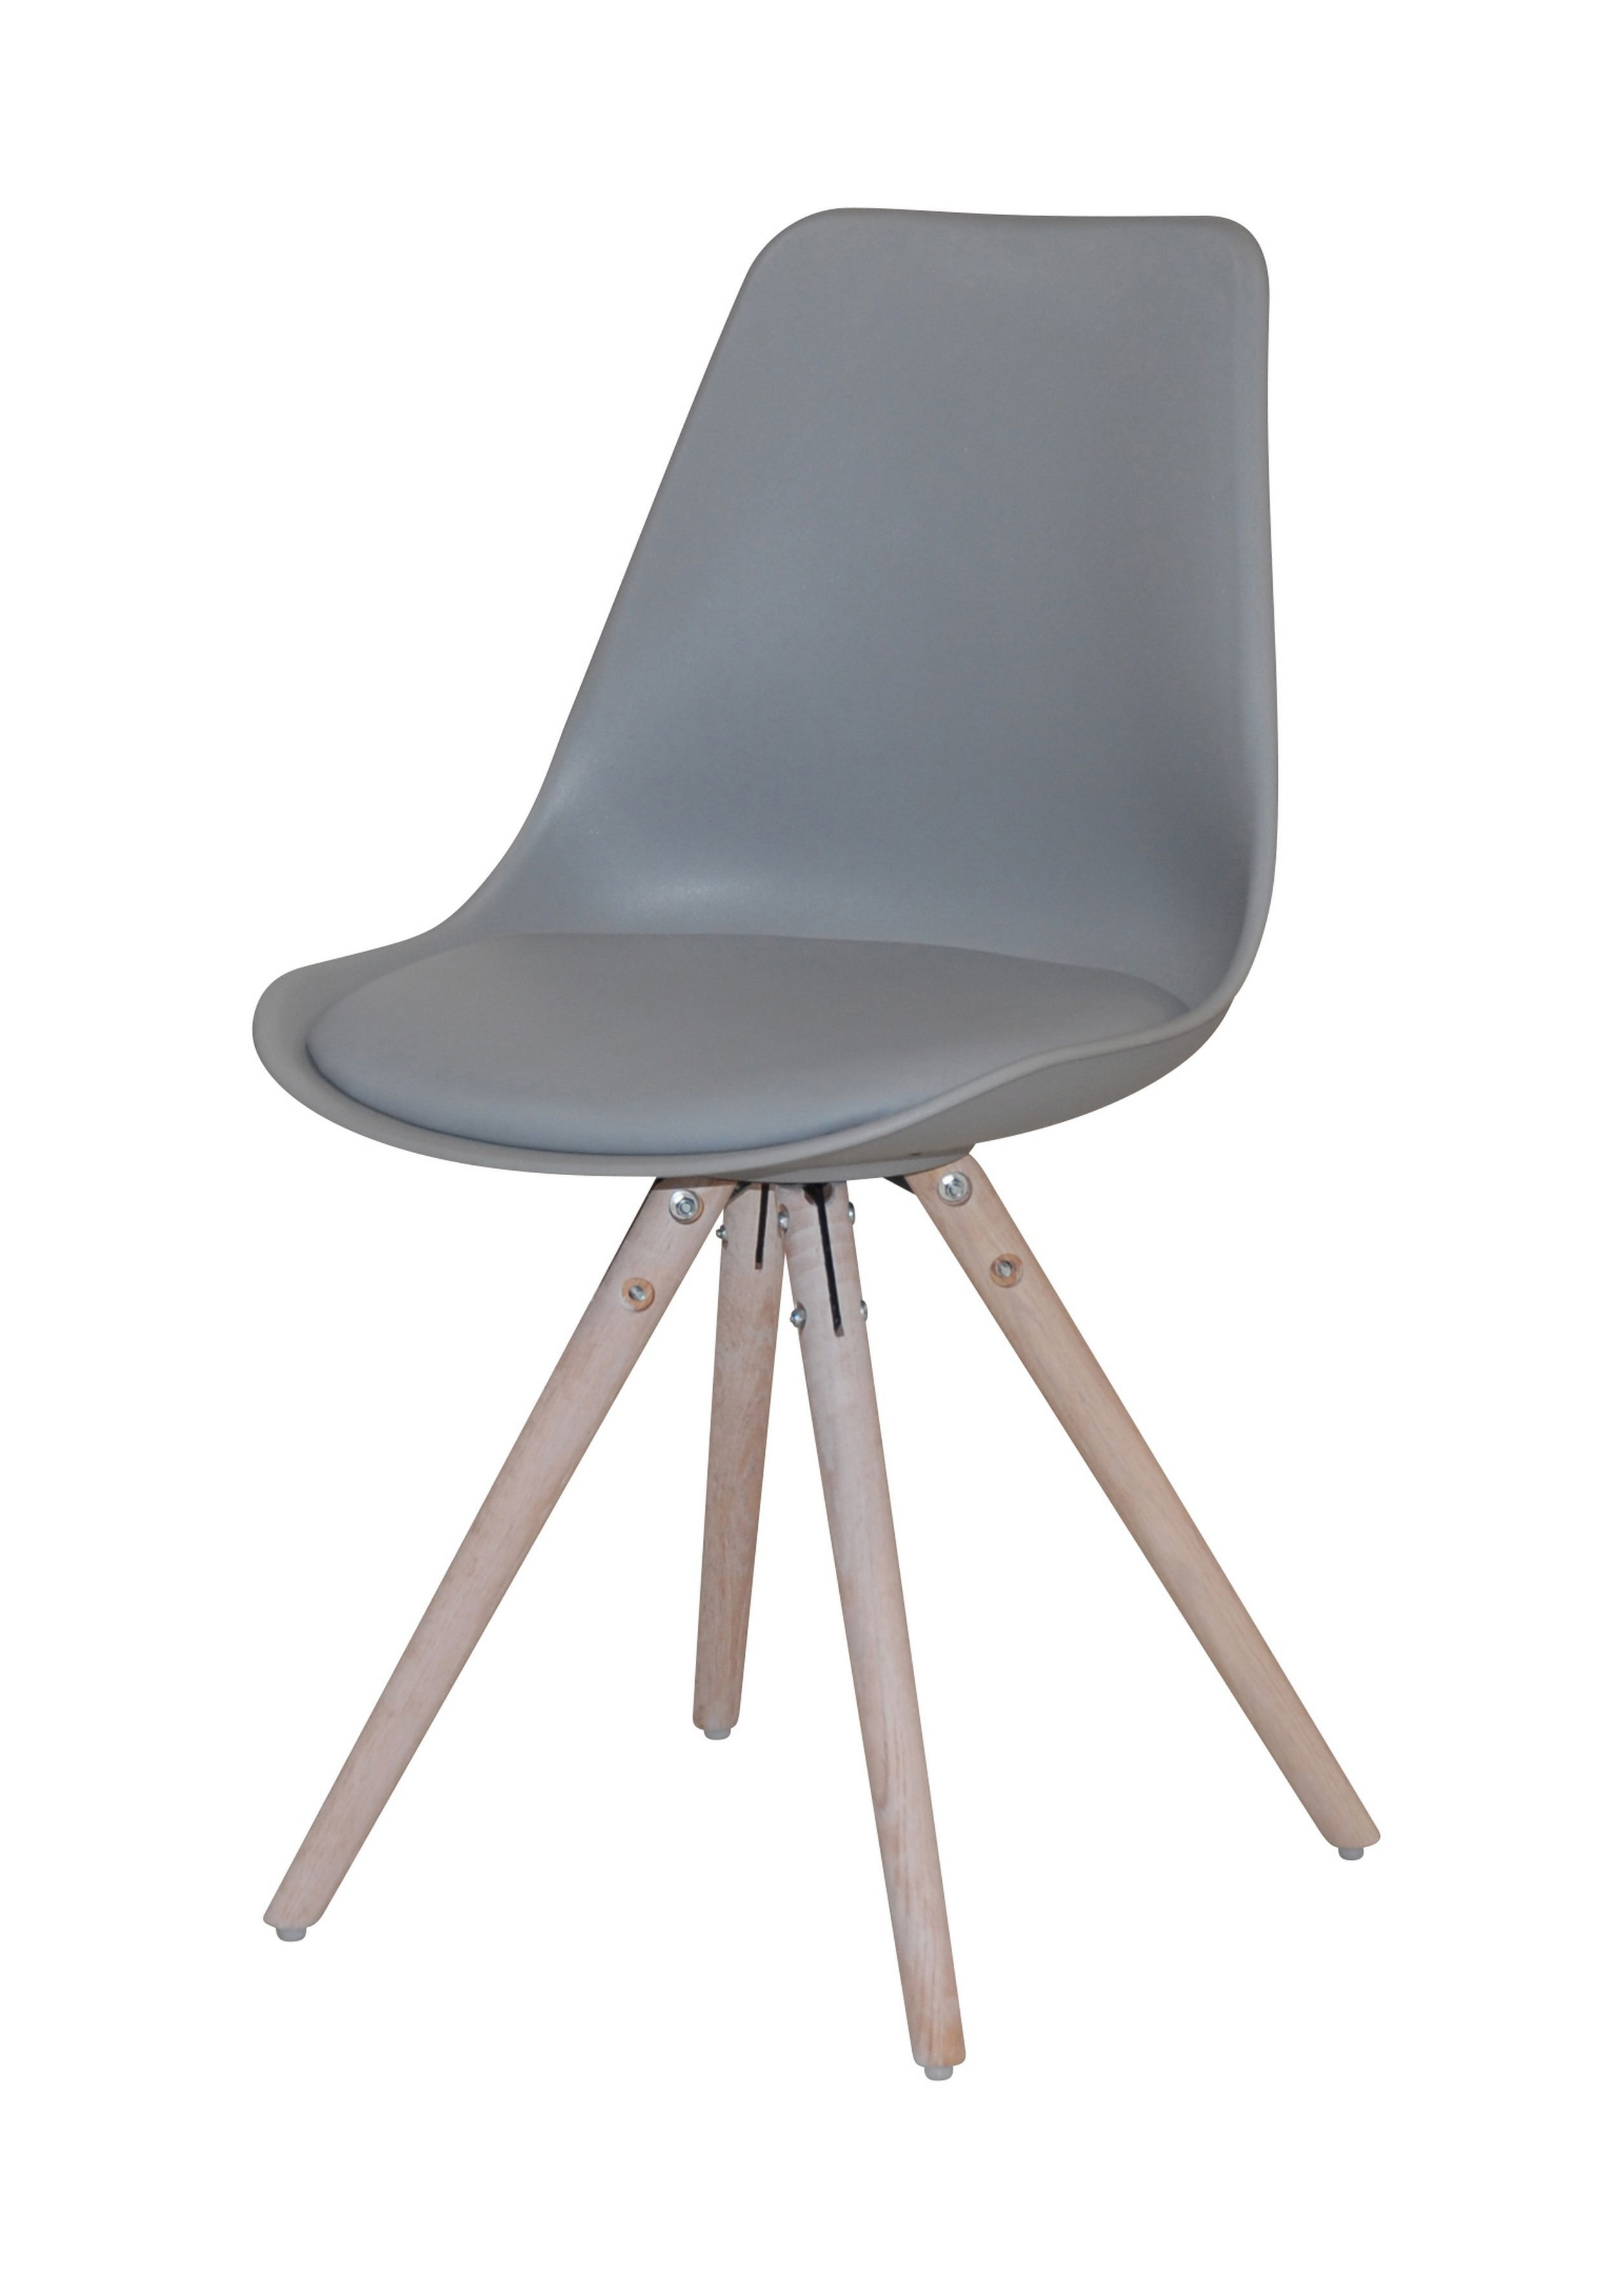 skalstol Woody Spisebordsstol   Flot skalstol med fantastisk siddekomfort  skalstol